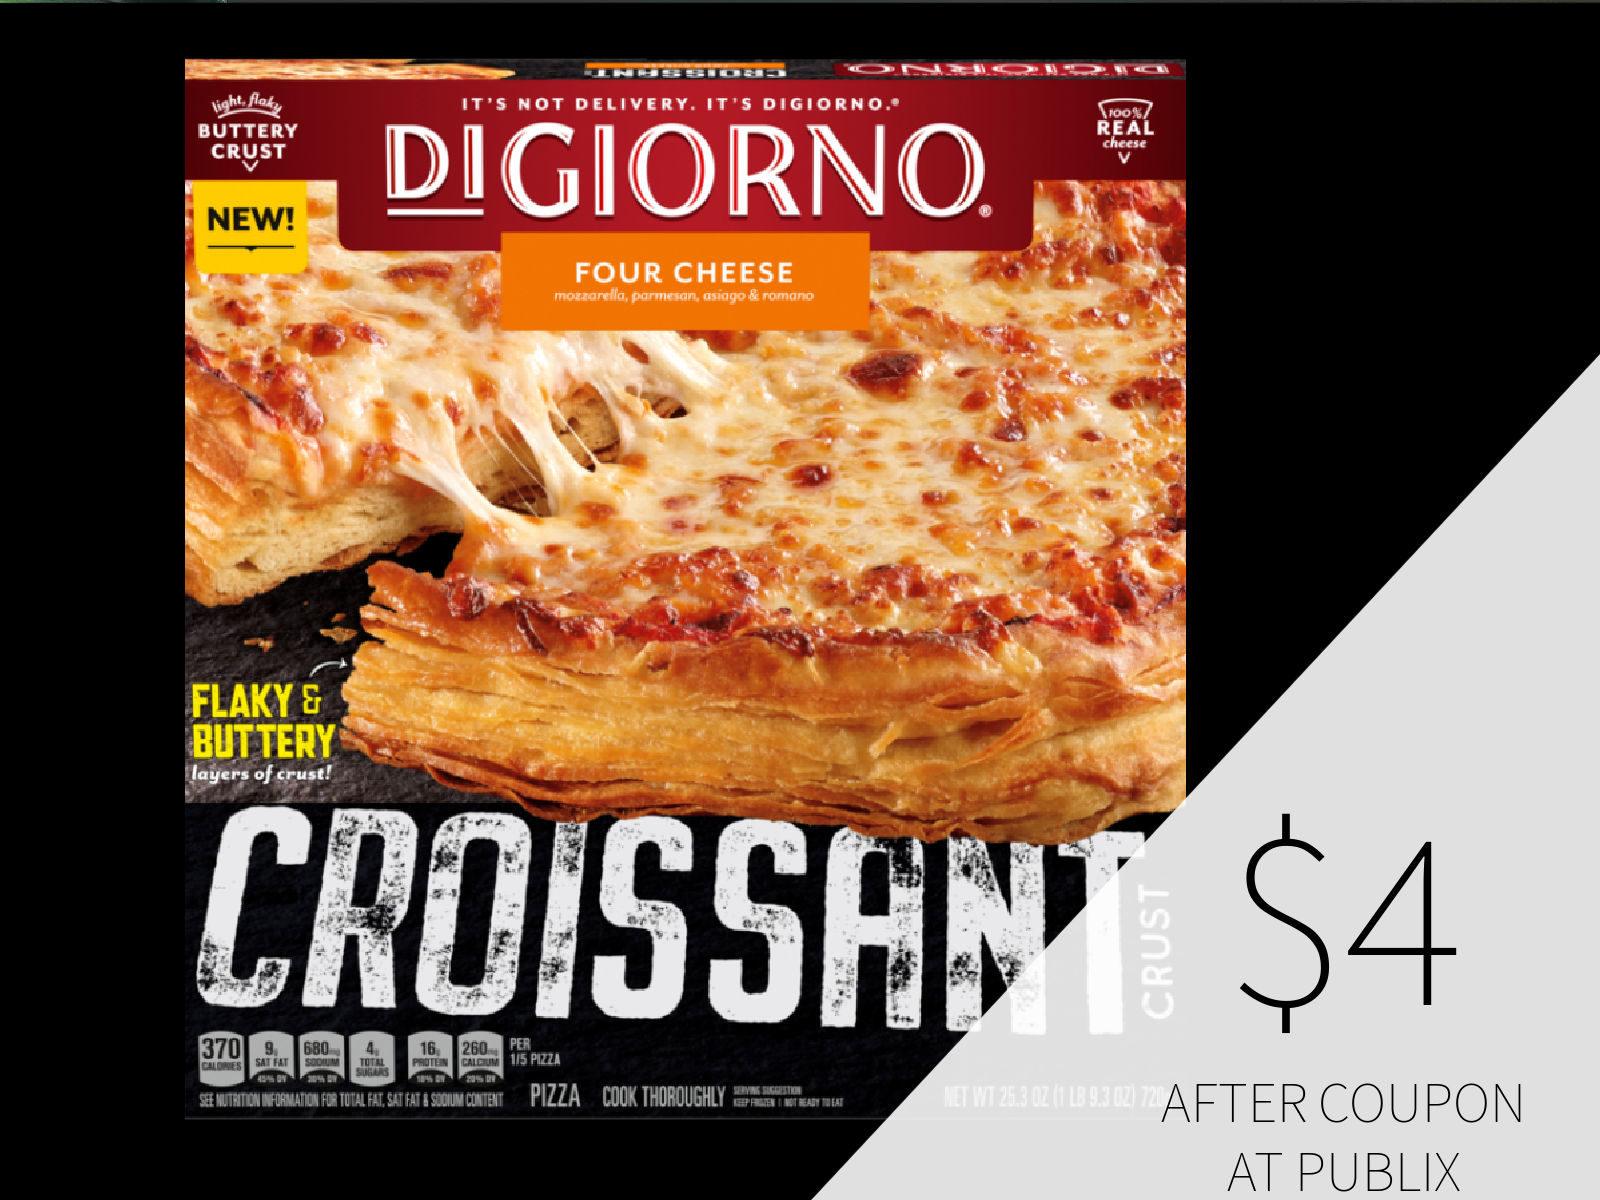 Croissant Crust DIGIORNO® Pizza Just $4 At Publix on I Heart Publix